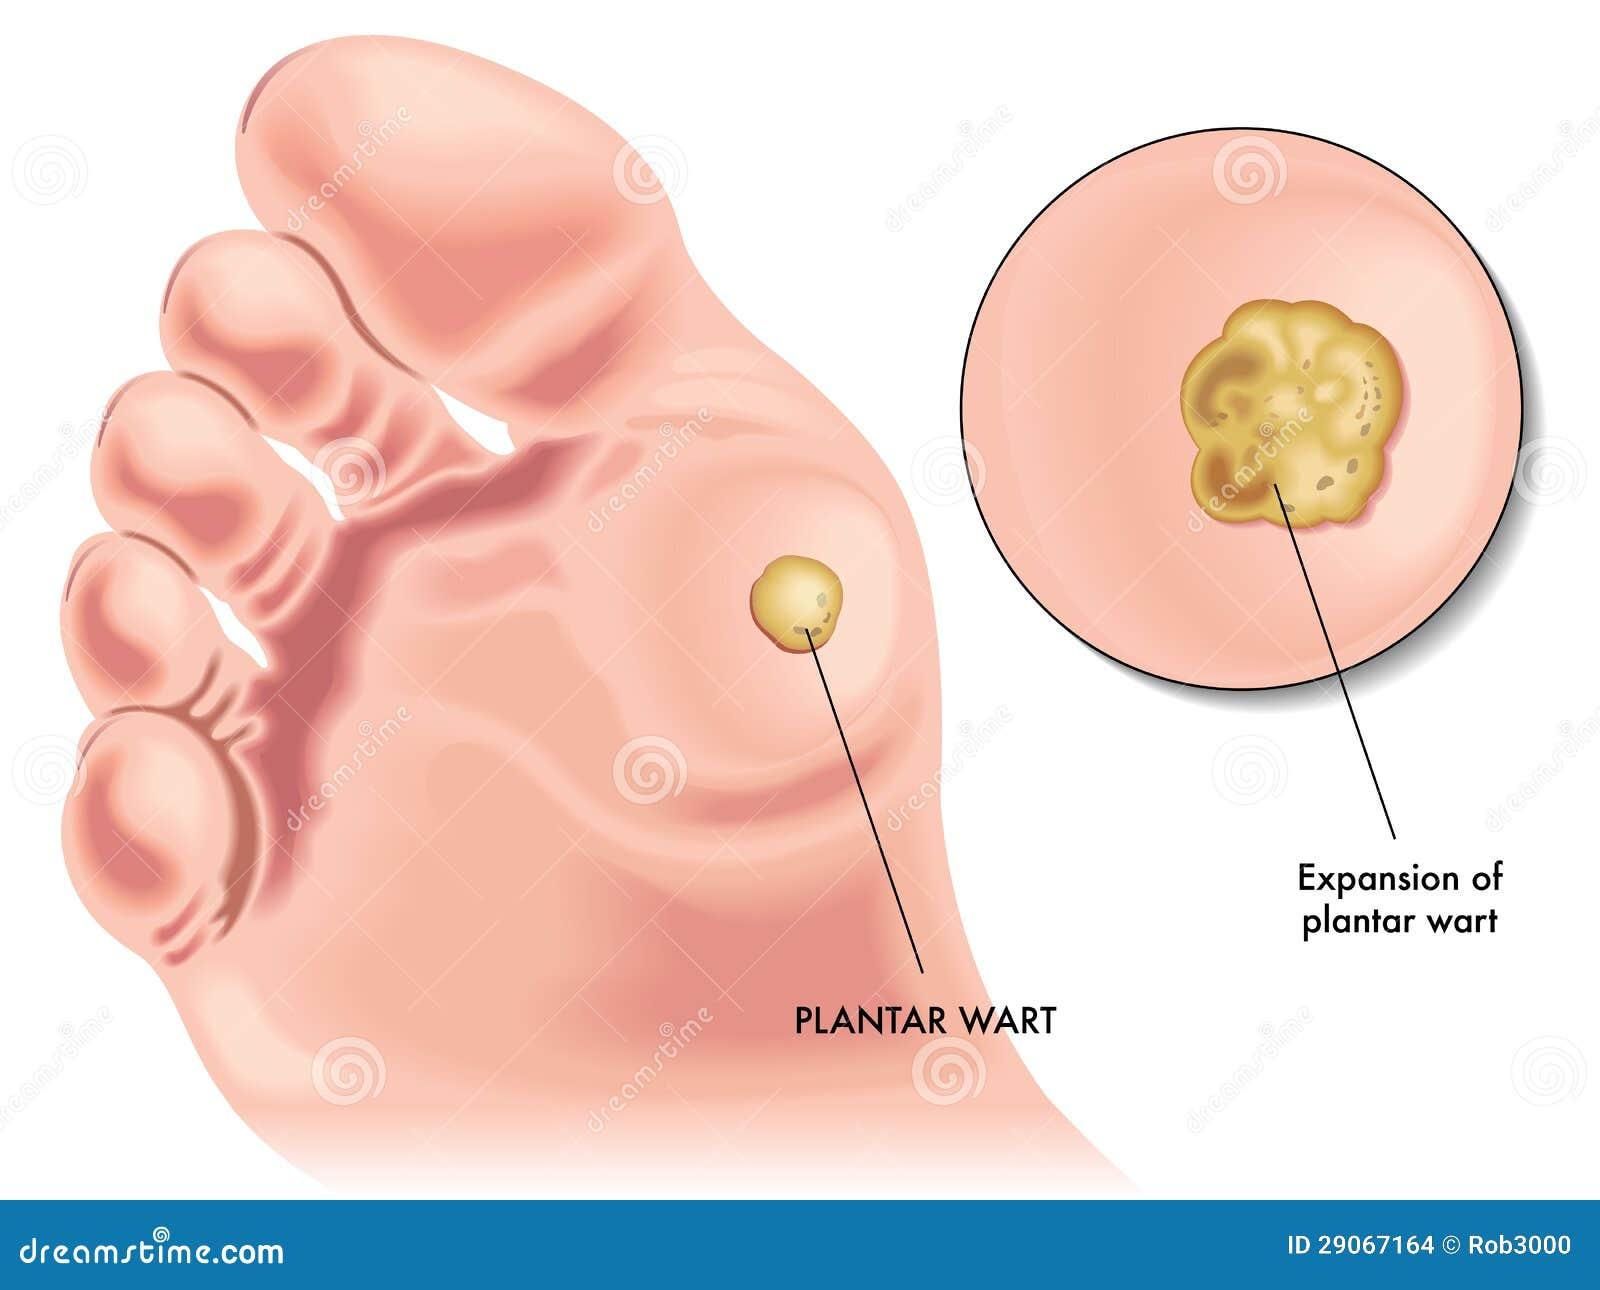 plantar wart stock vector illustration of skin epithelial 29067164 rh dreamstime com foot wart diagram plantar wart cross section diagram